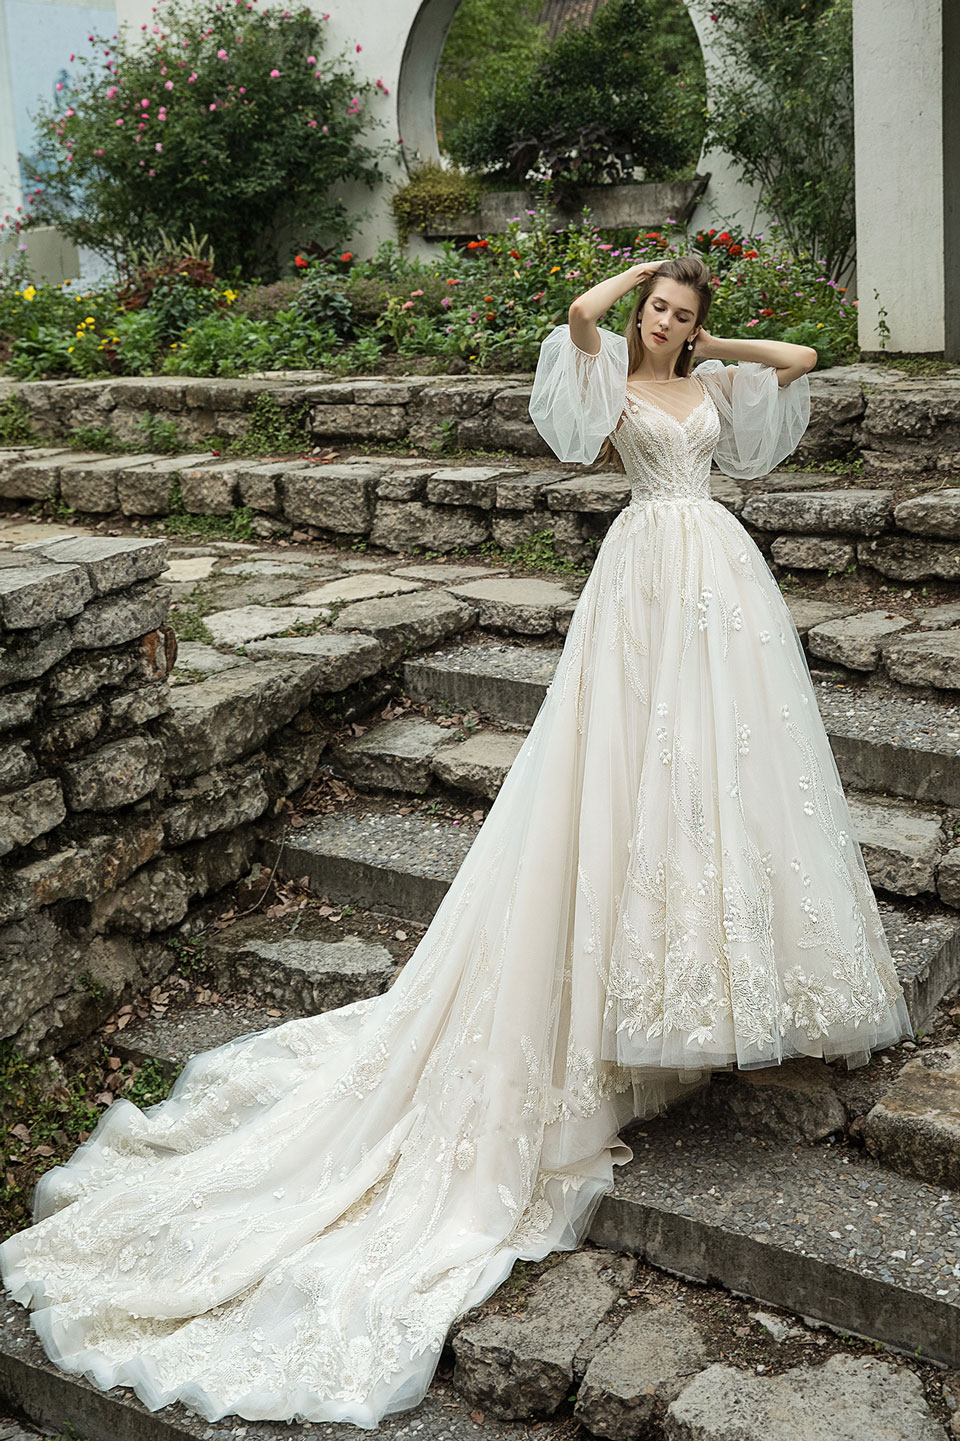 floral-lace-wedding-dress-train.jpg